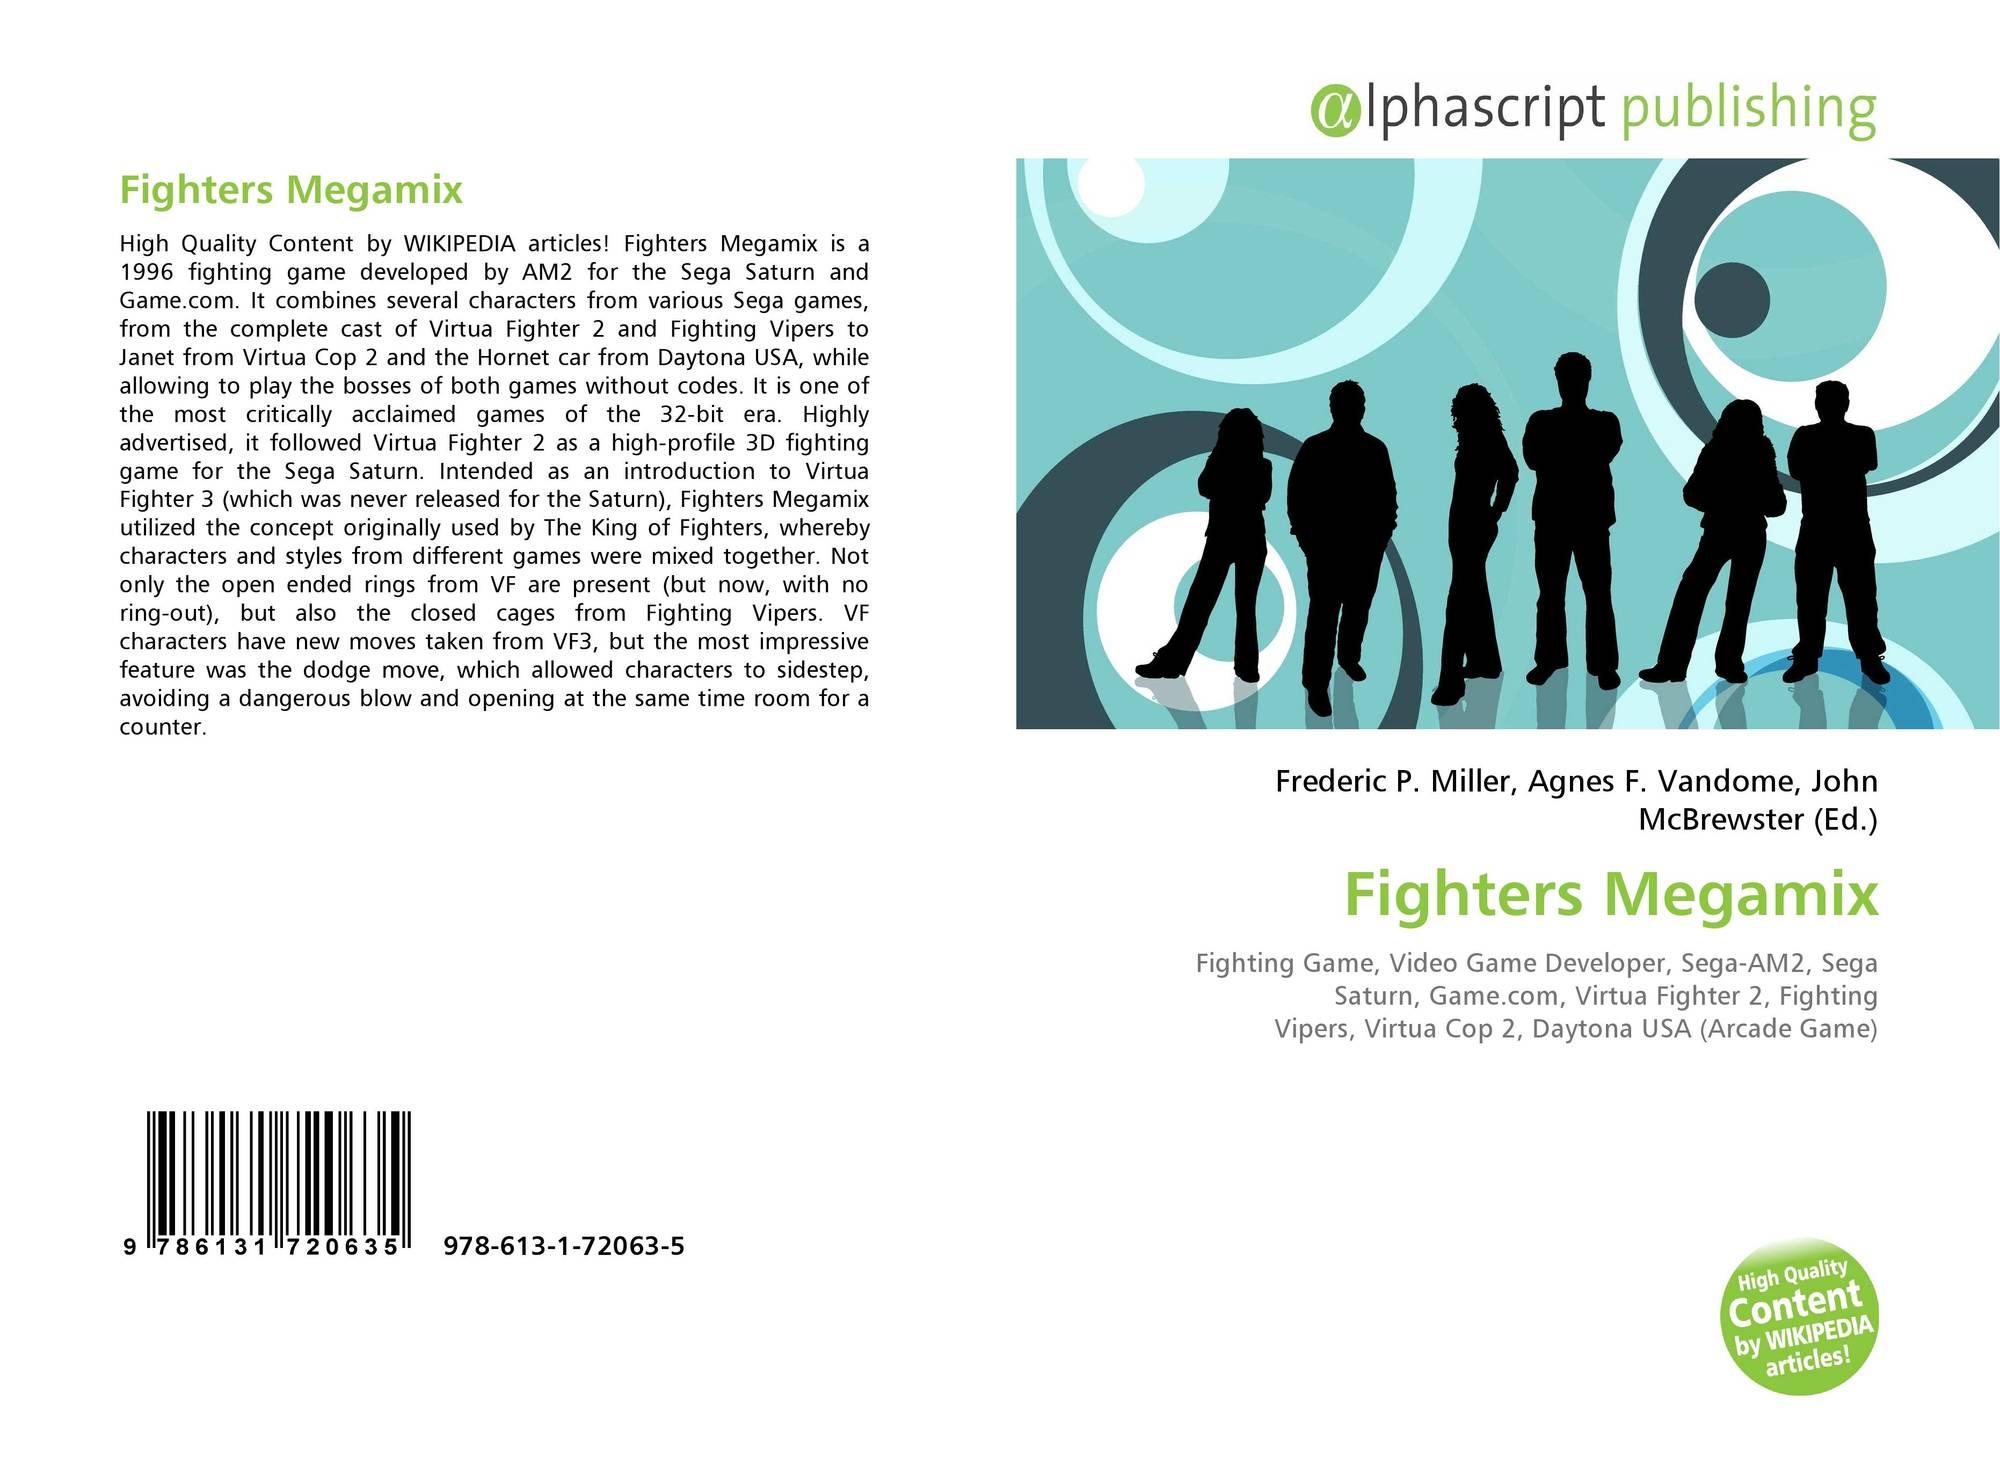 Fighters Megamix, 978-613-1-72063-5, 6131720630 ,9786131720635